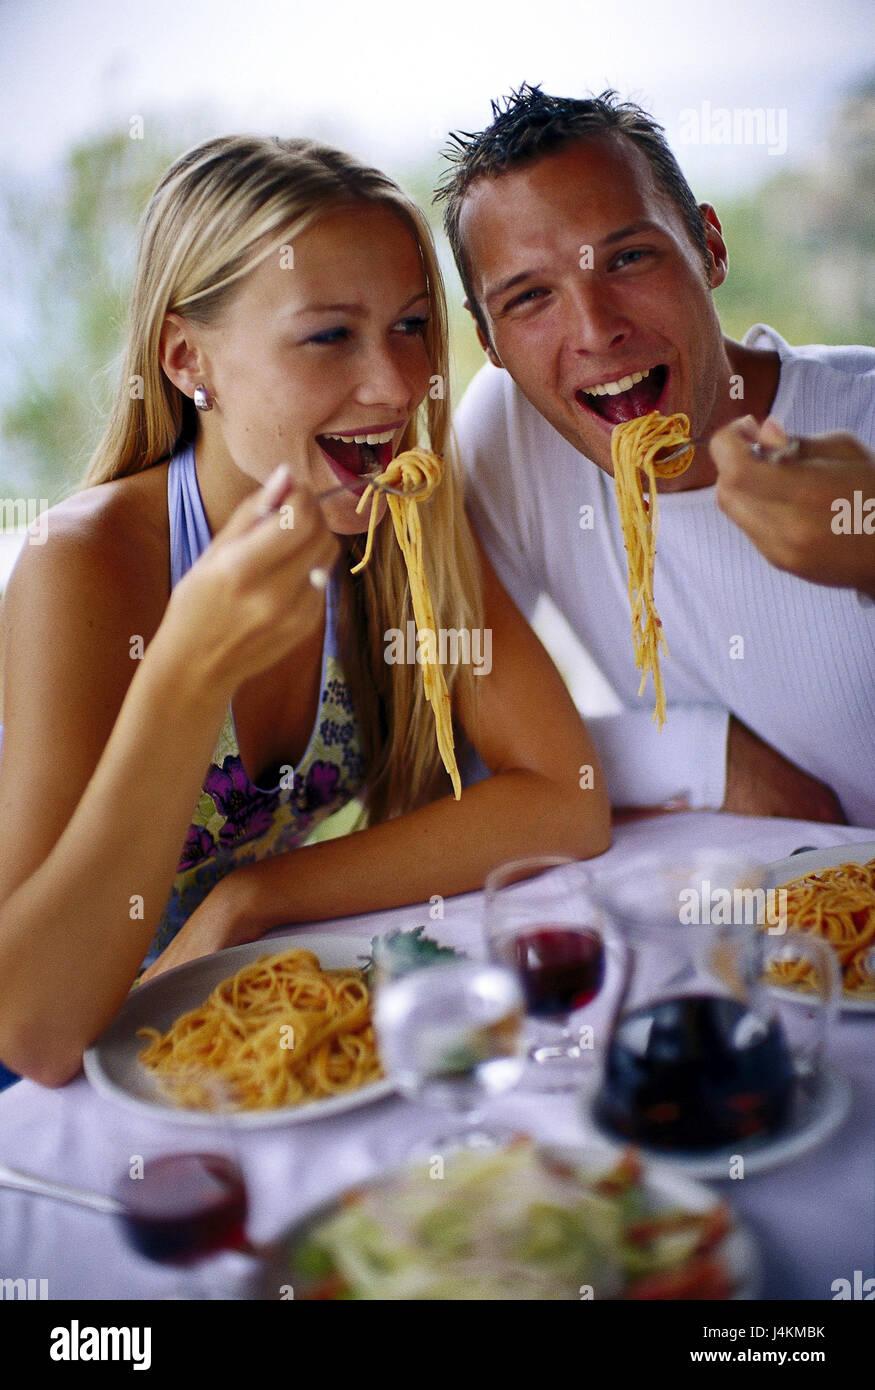 Restaurant, paar, Spaghetti, Essen, Salatteller, Gläser, Getränke ...